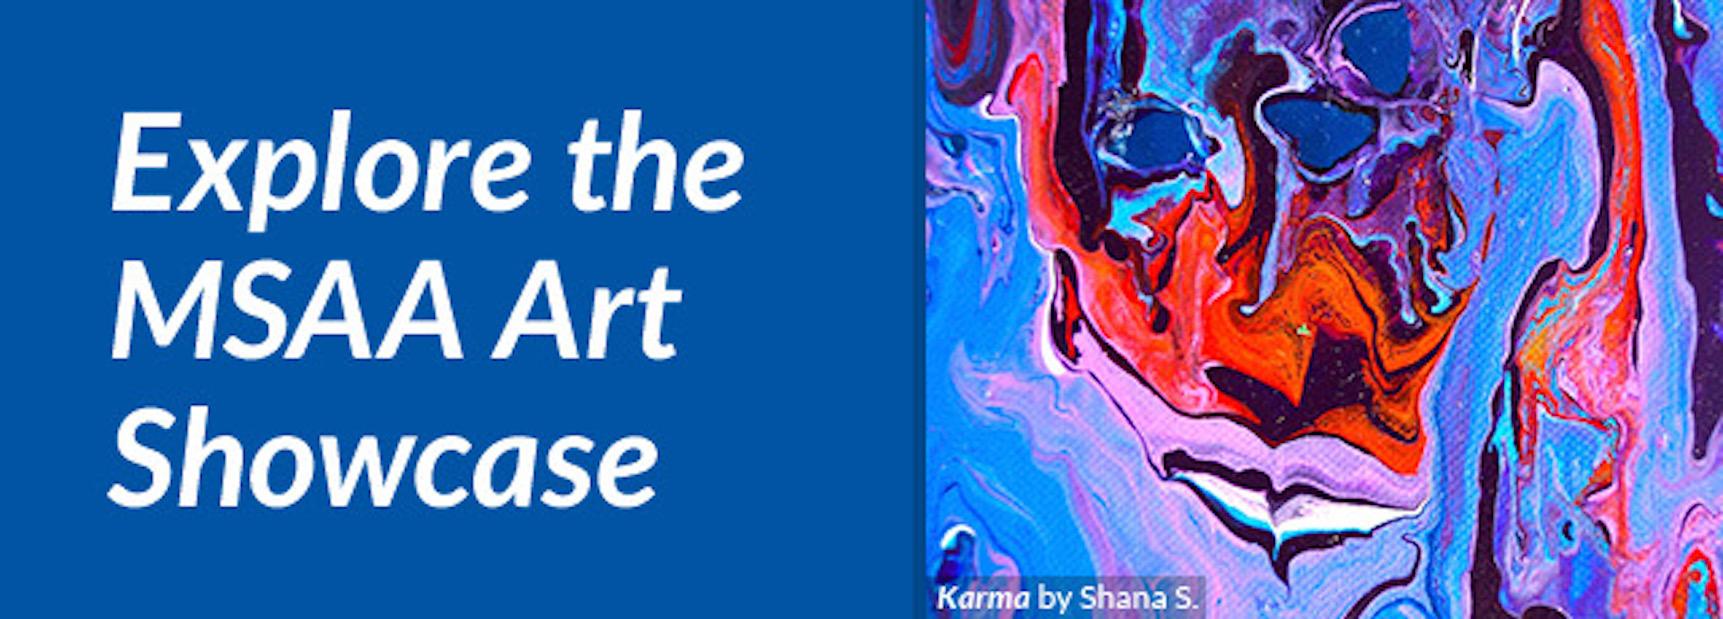 2018 MSAA Artist Showcase featuring Shana Stern